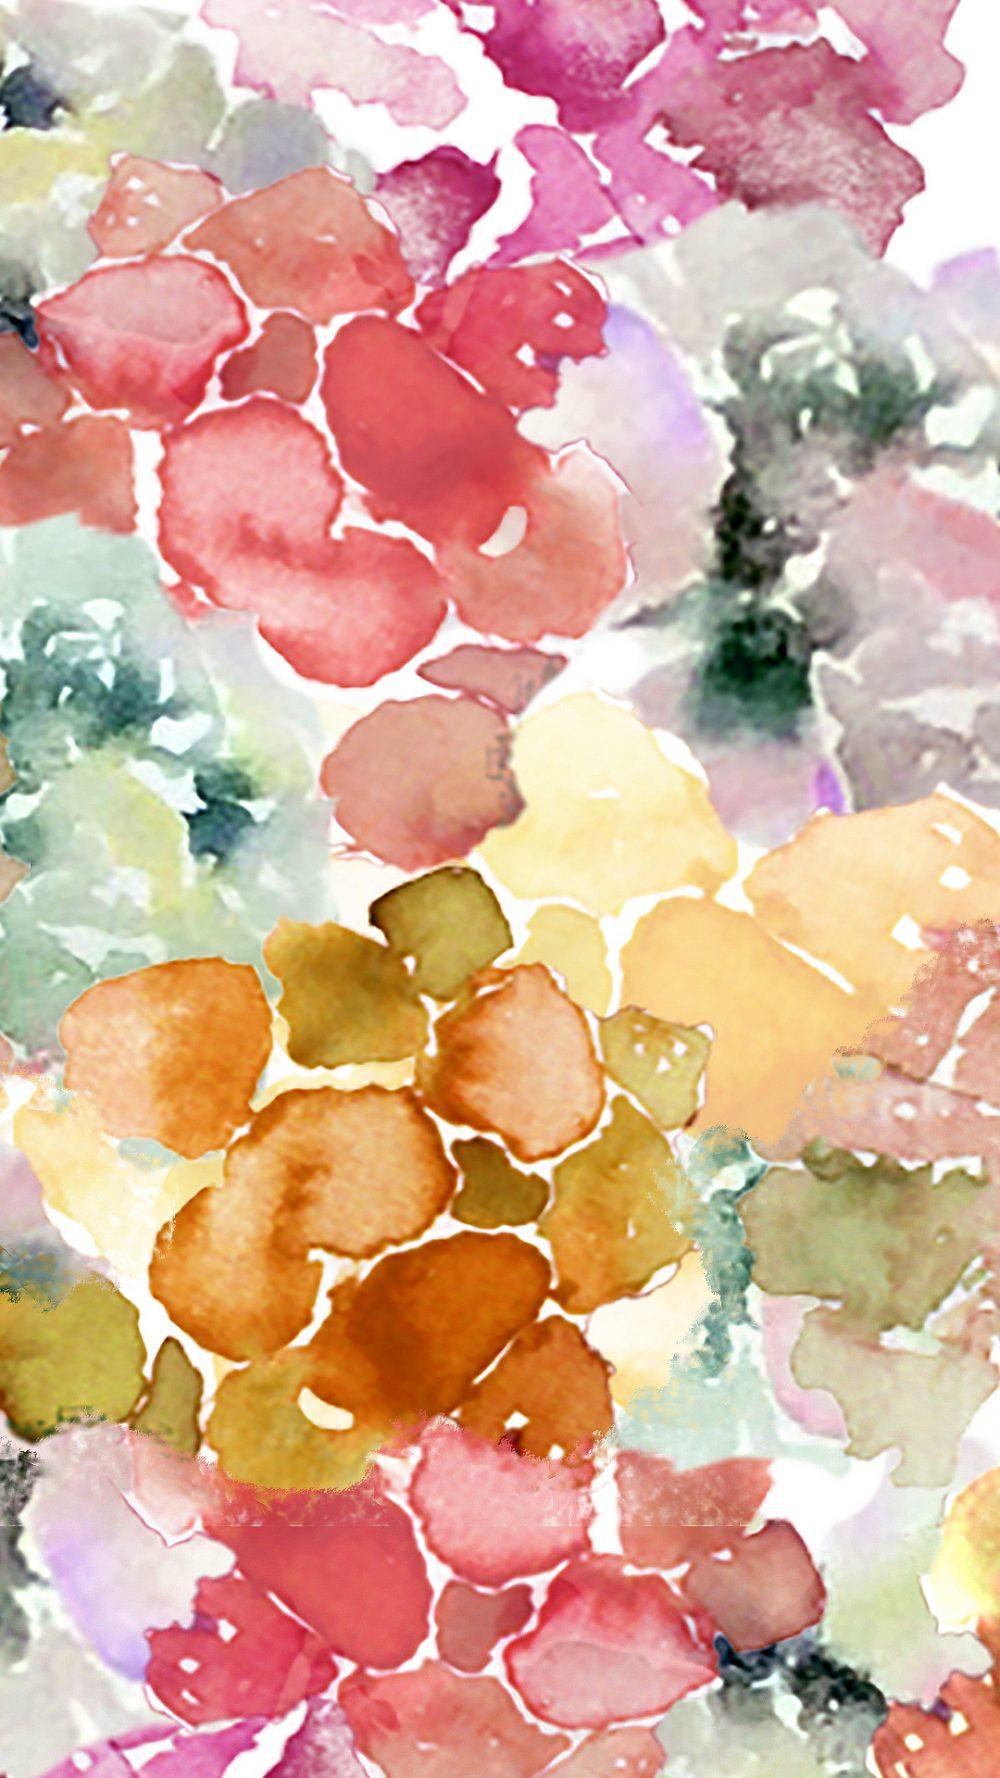 Download Wallpaper Macbook Chic - fall-hydrangeas-1  Collection_3216100.jpg